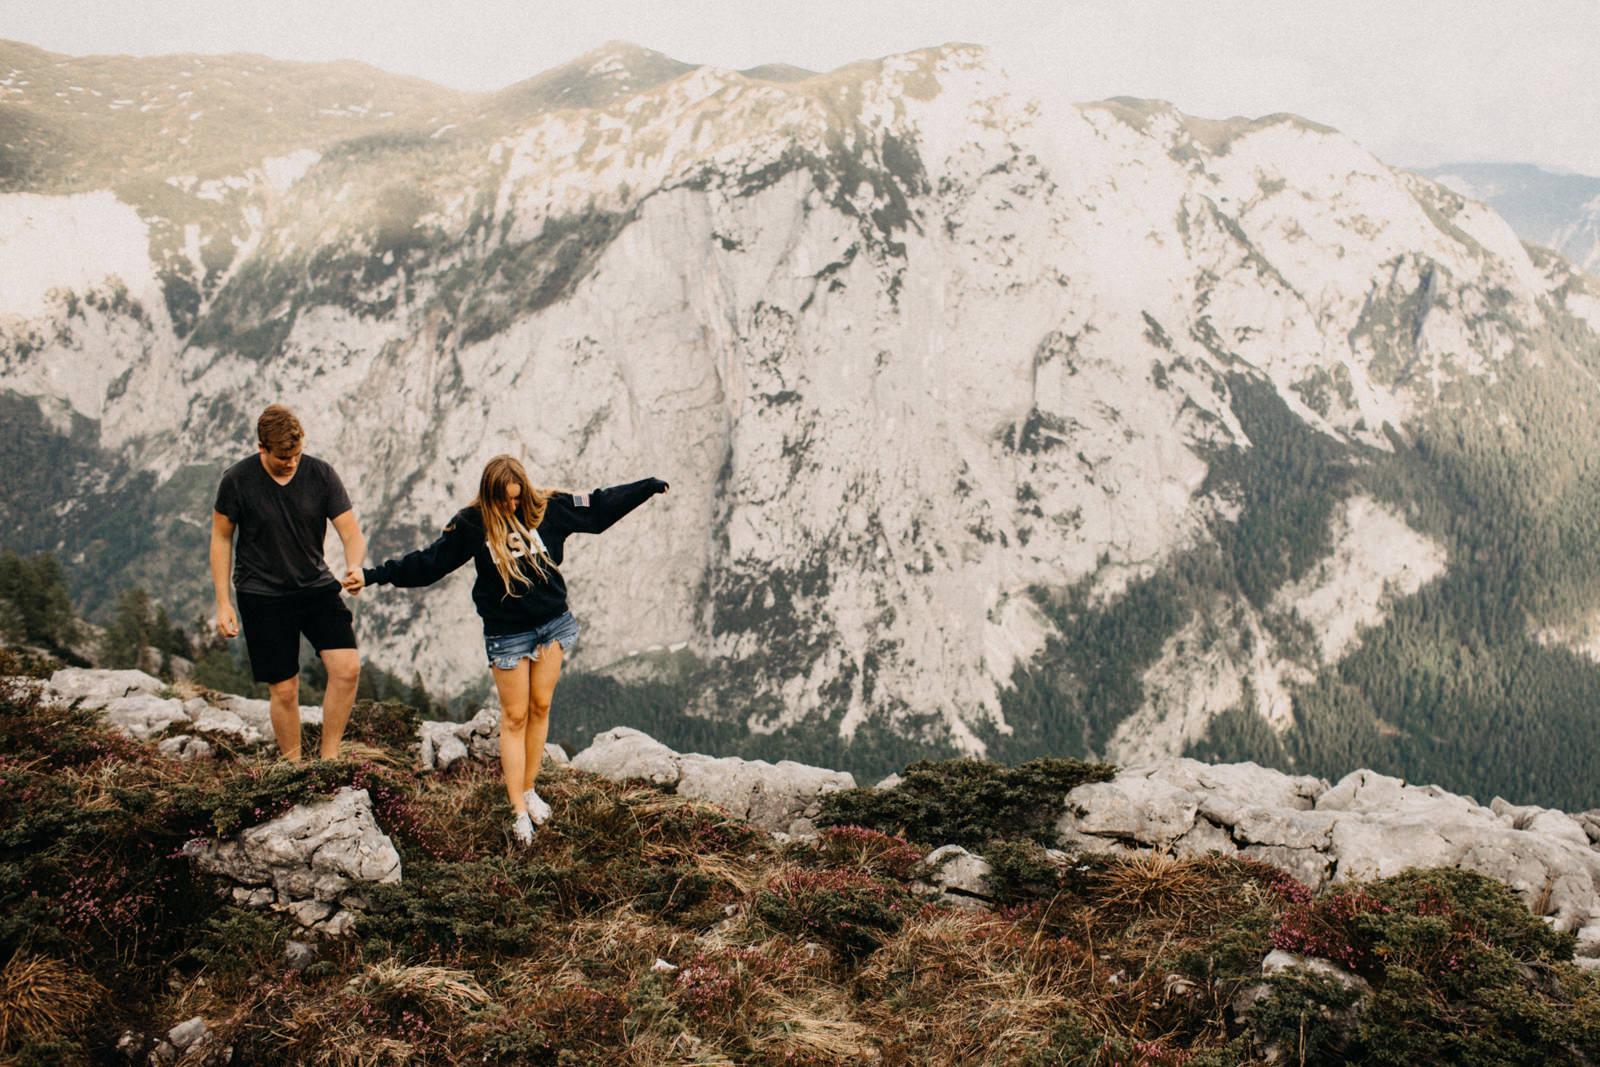 hiking around mountains